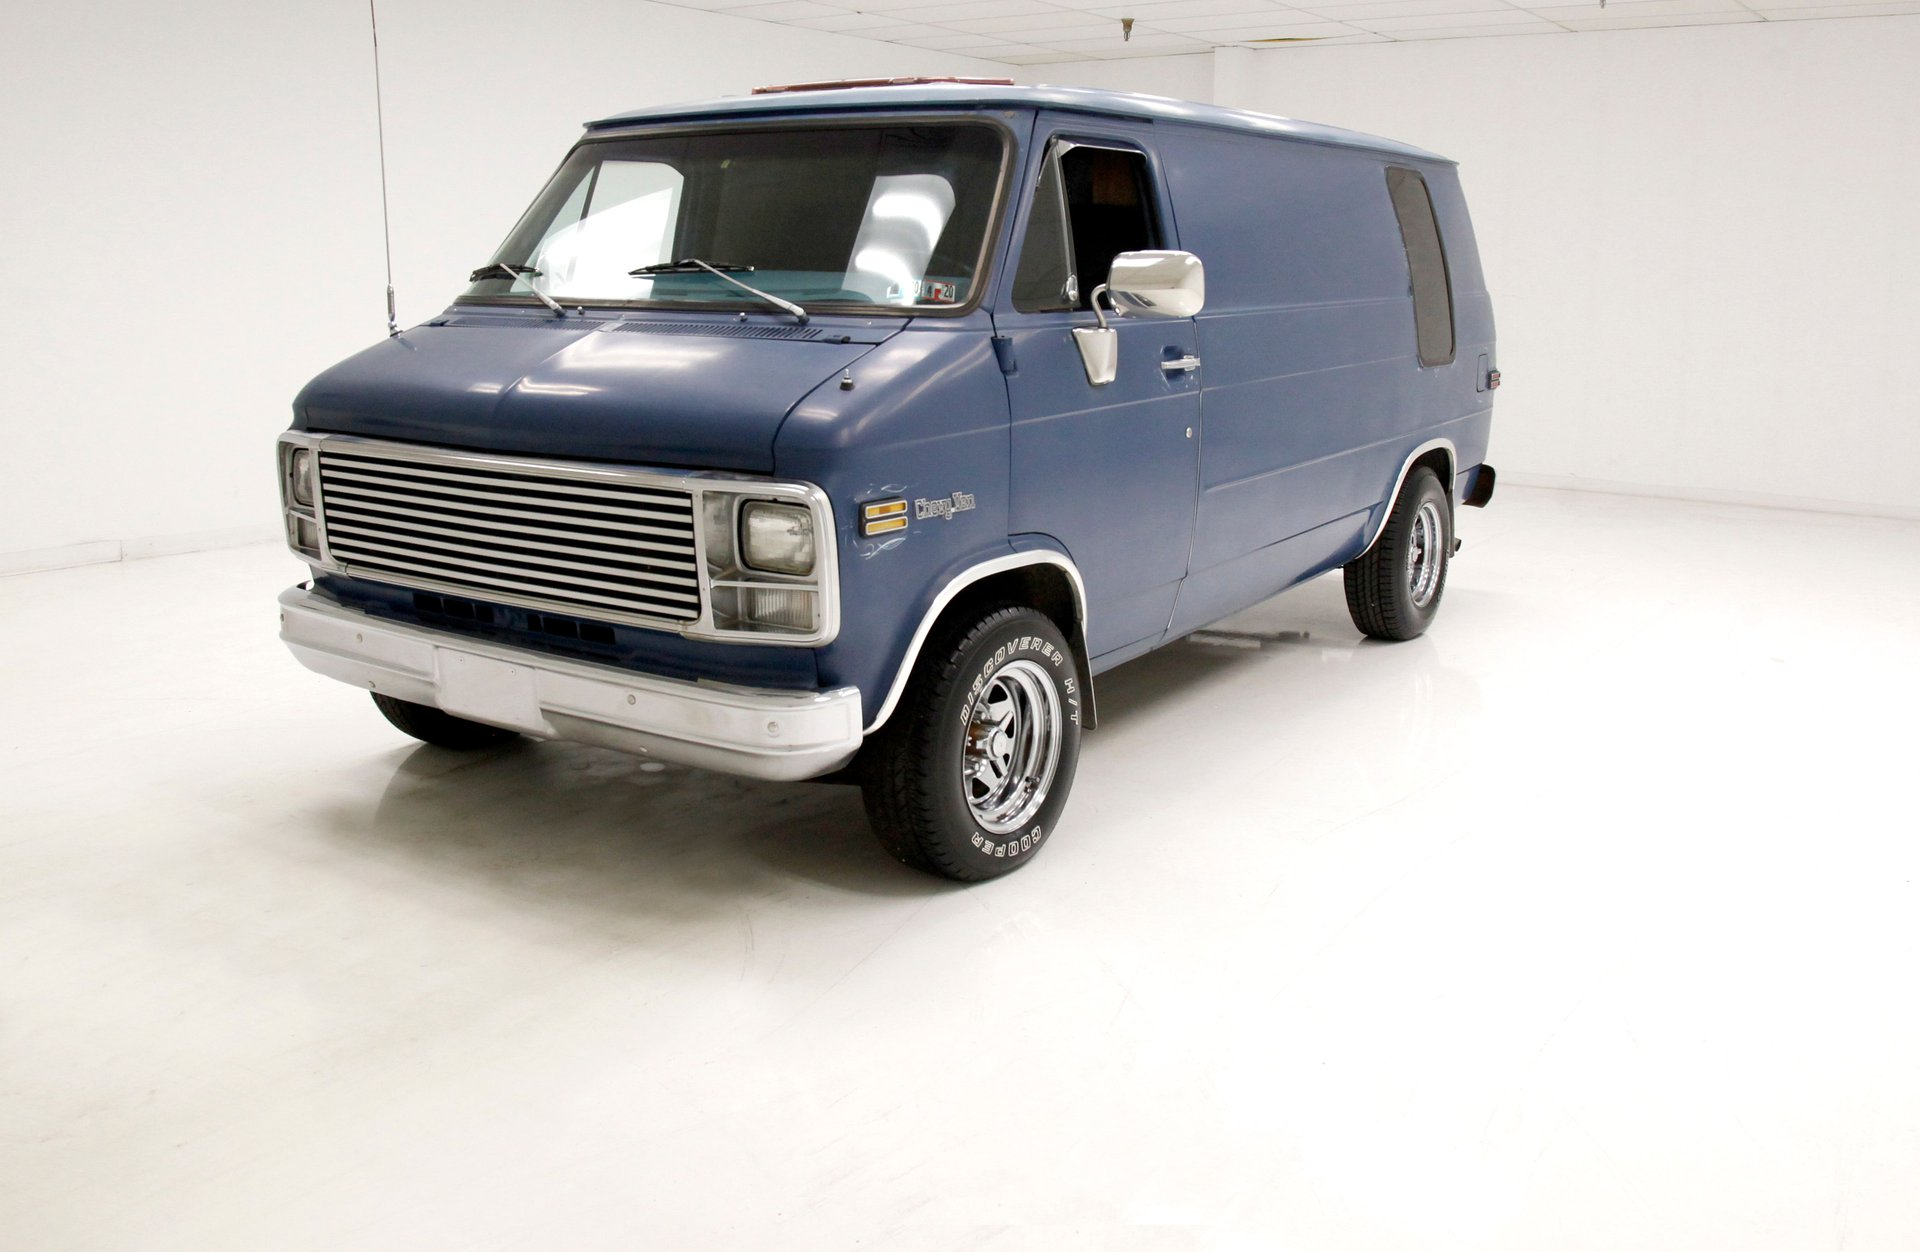 1979 Chevrolet G10